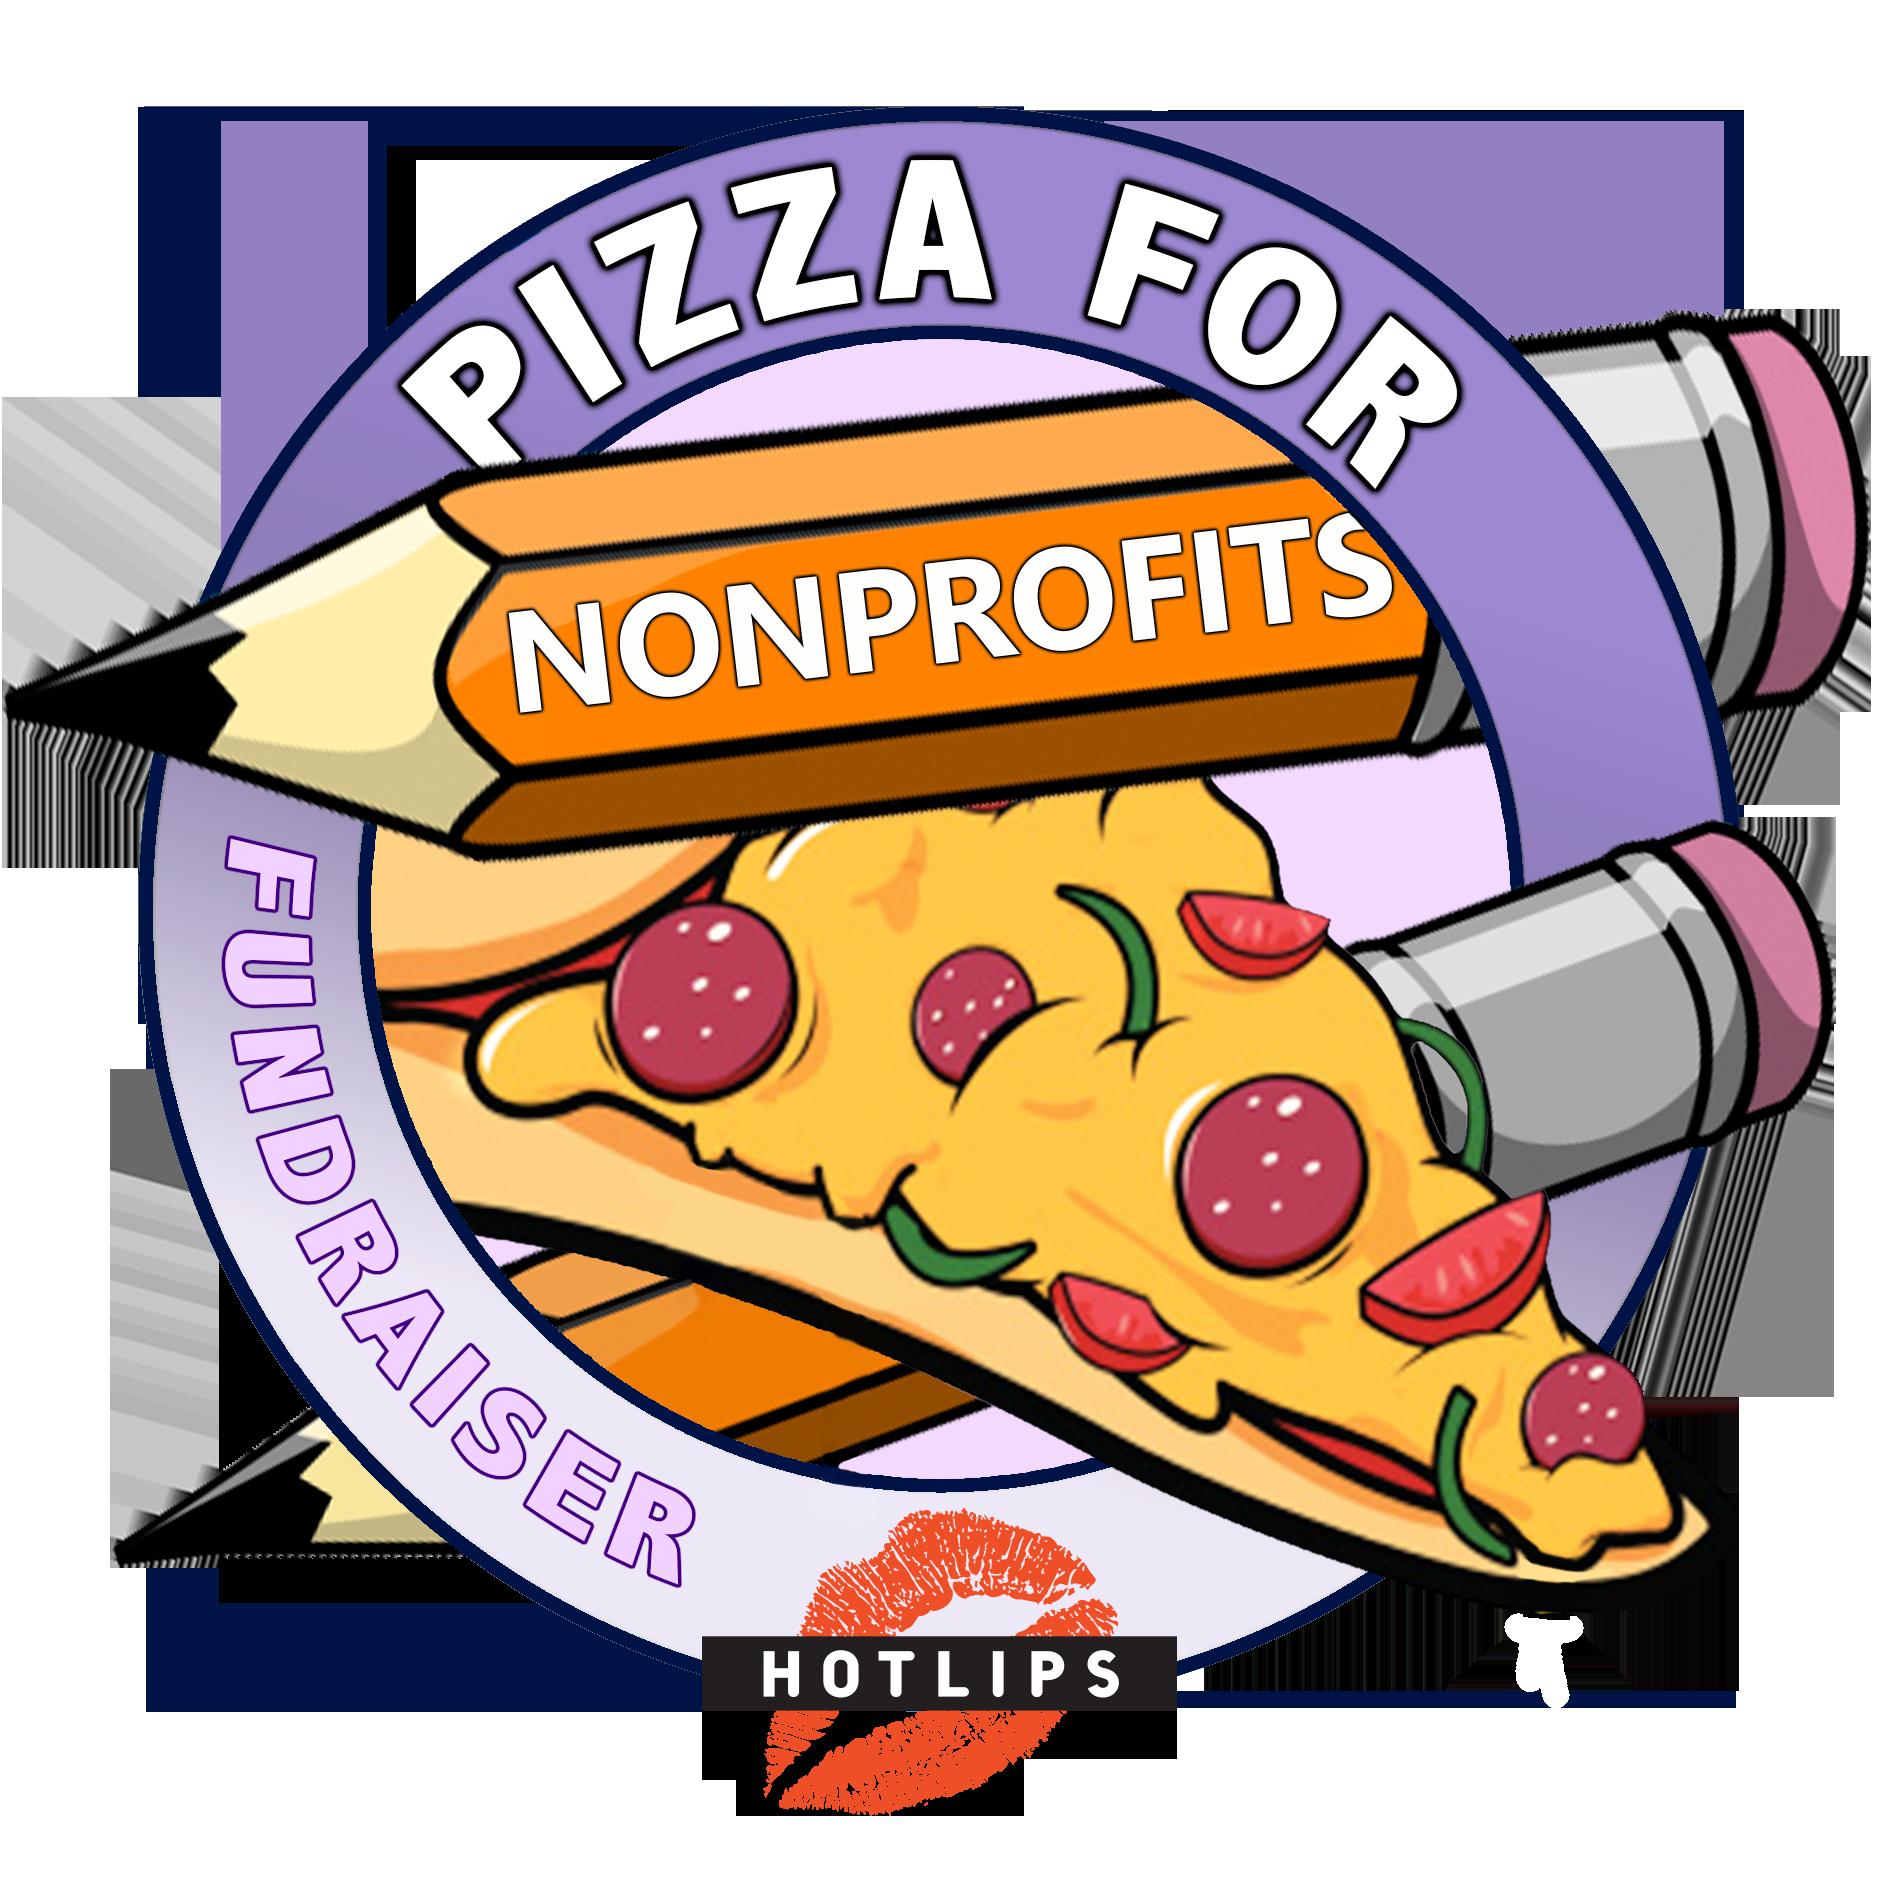 Nonprofit fundraising in Portland Oregon